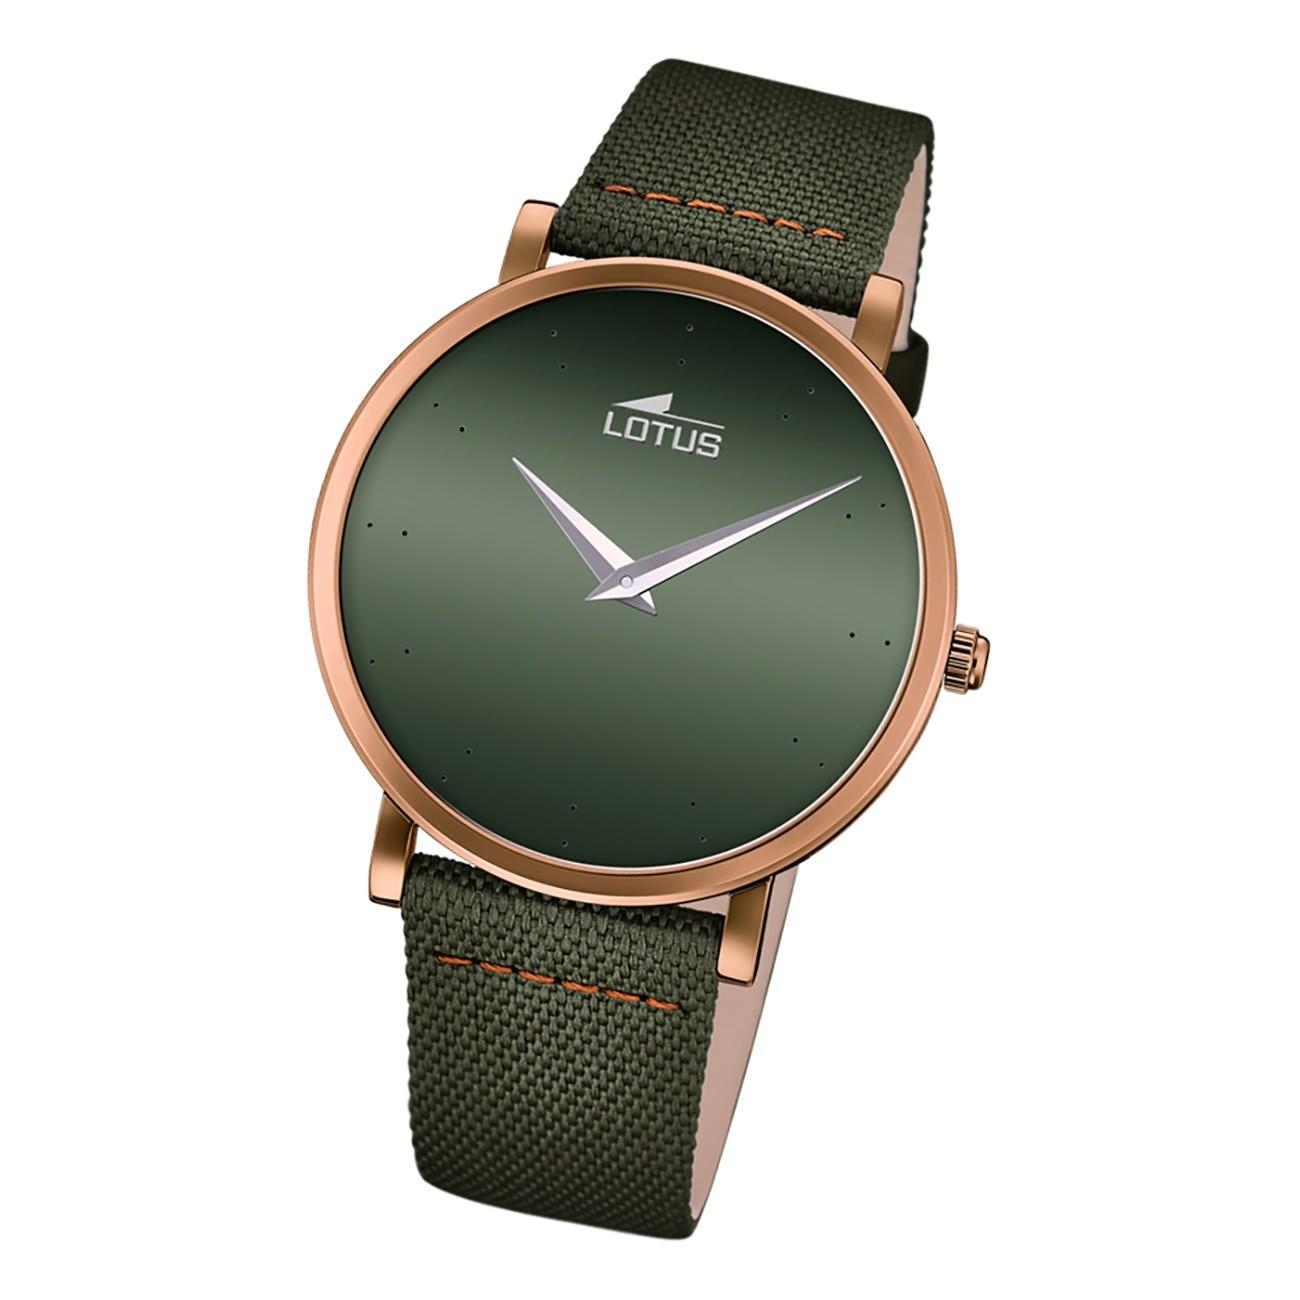 Lotus Herren Armbanduhr Minimalist 18782/2 Analog Leder grün UL18782/2